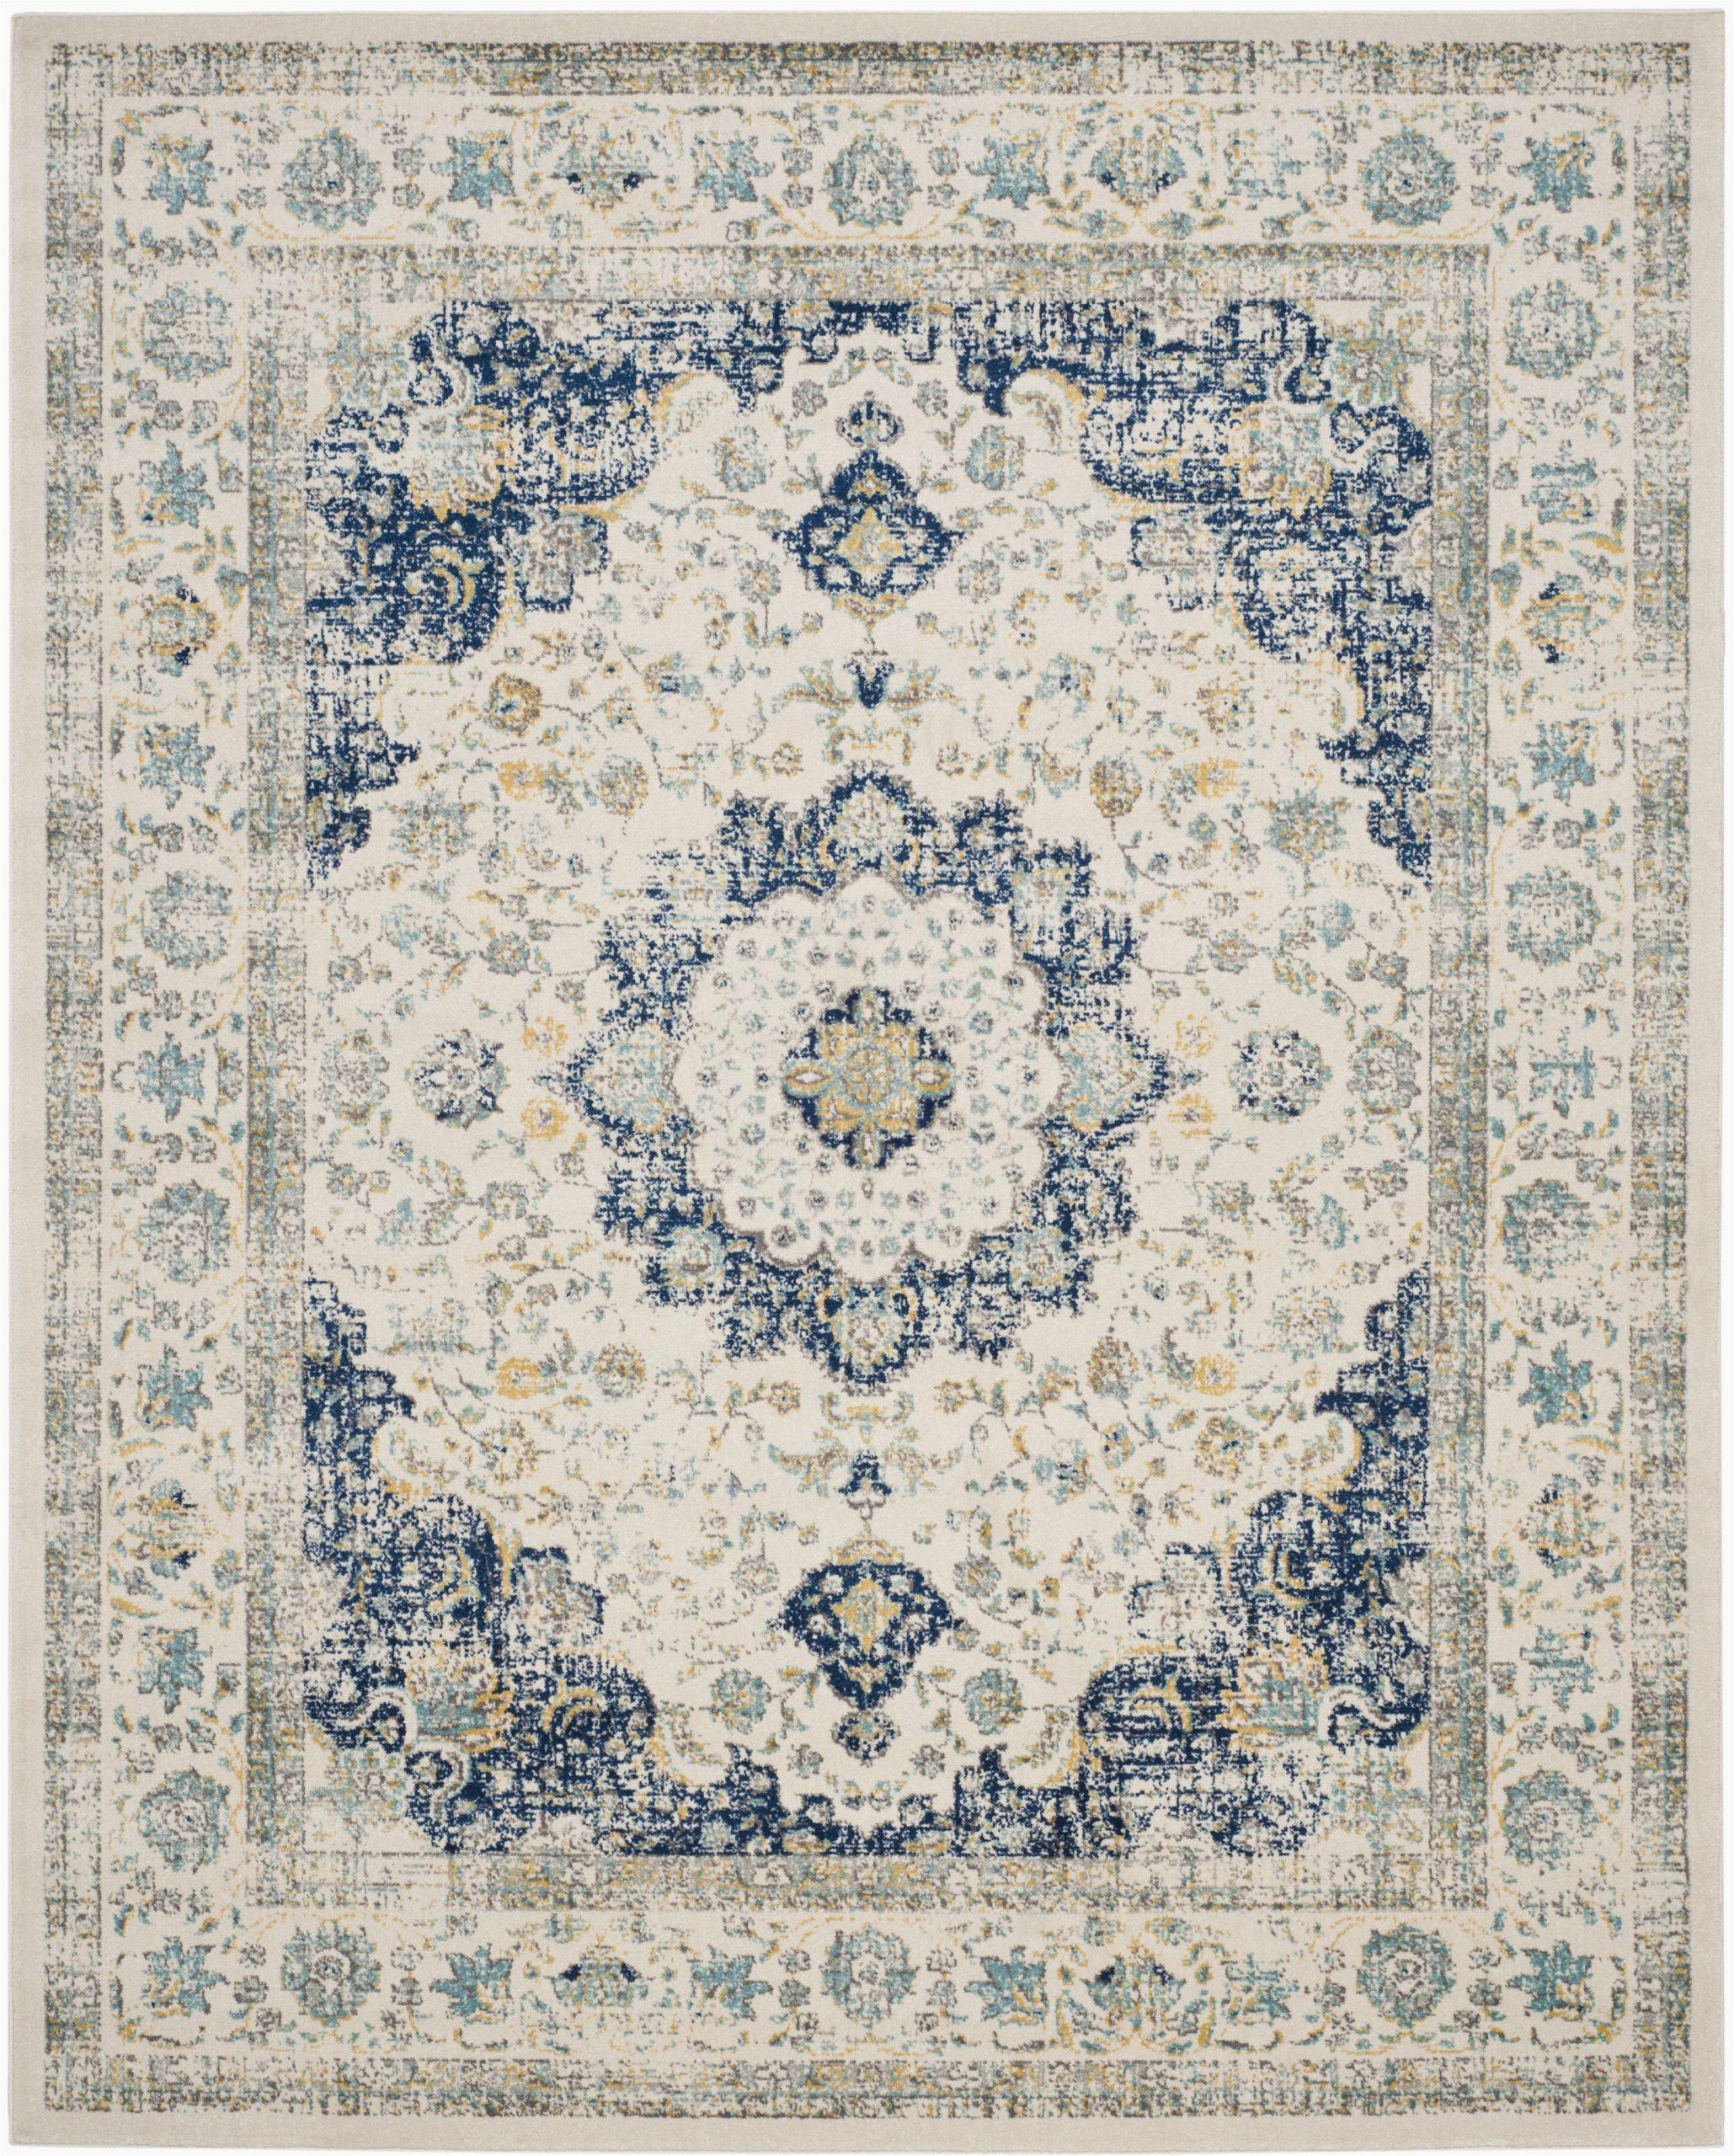 Wayfair Rugs 8×10 Blue Blue oriental area Rugs You Ll Love In 2020